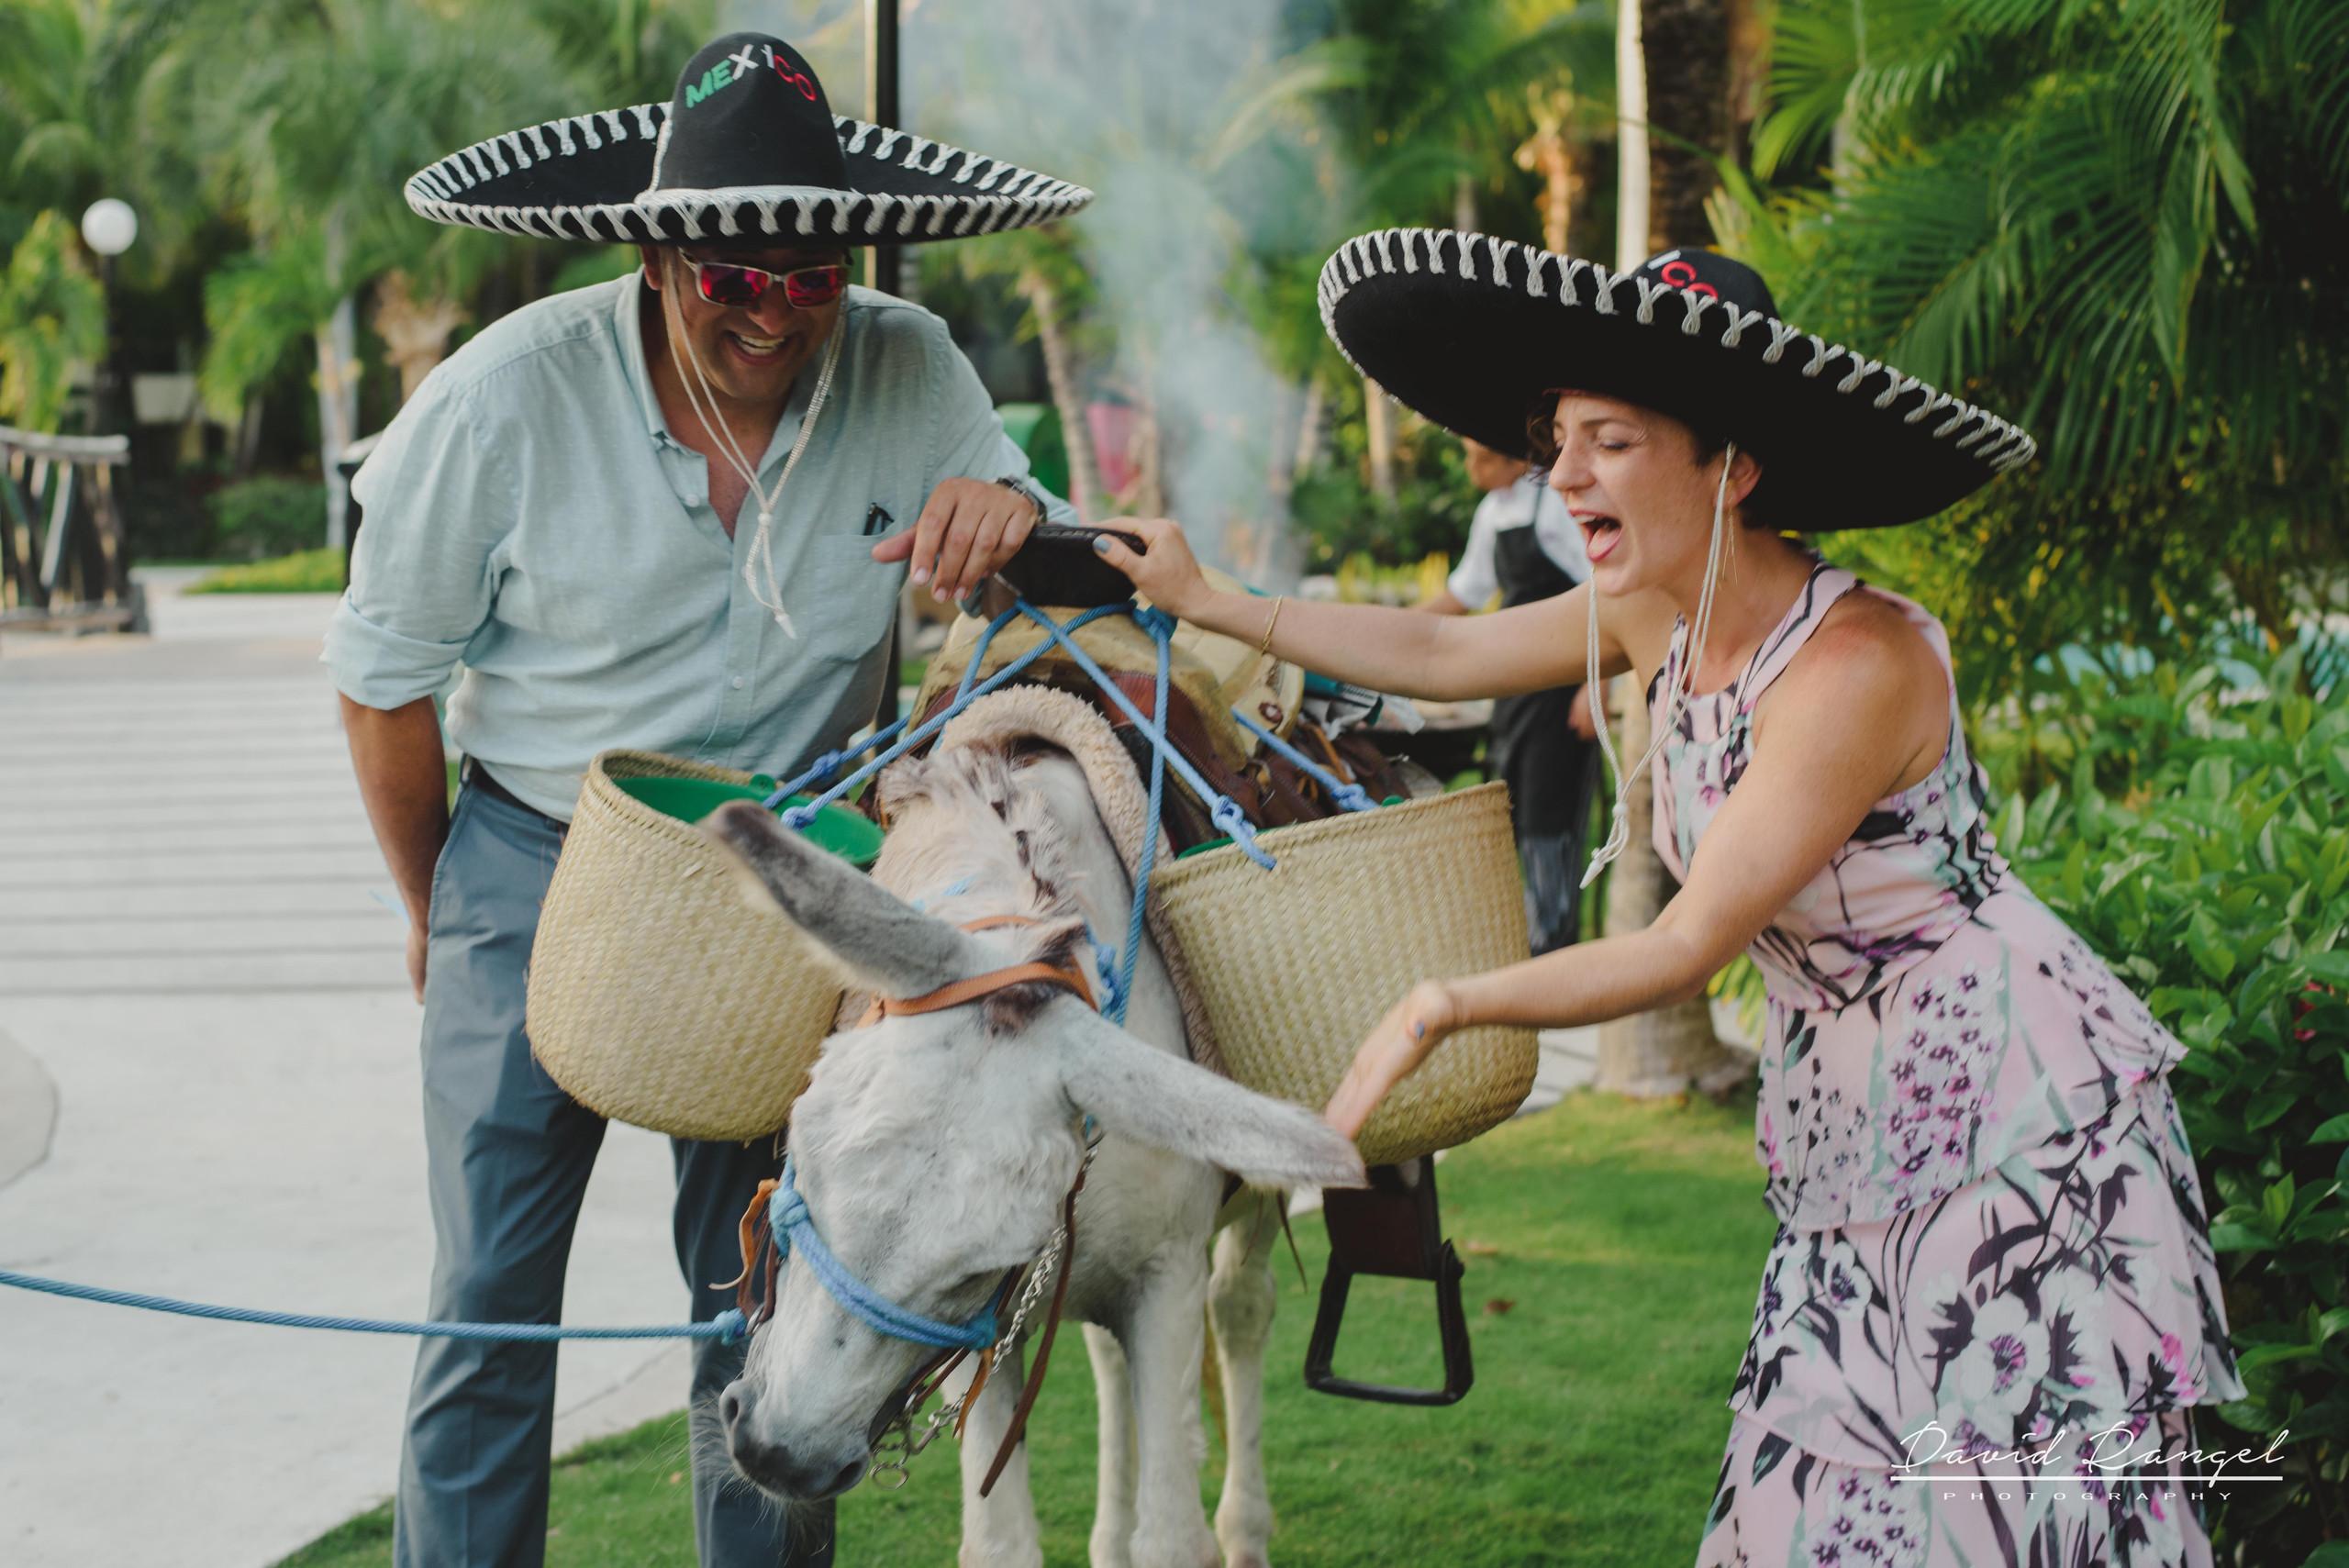 donkey+photo+guest+garden+reception+mexican+sombreros+hats